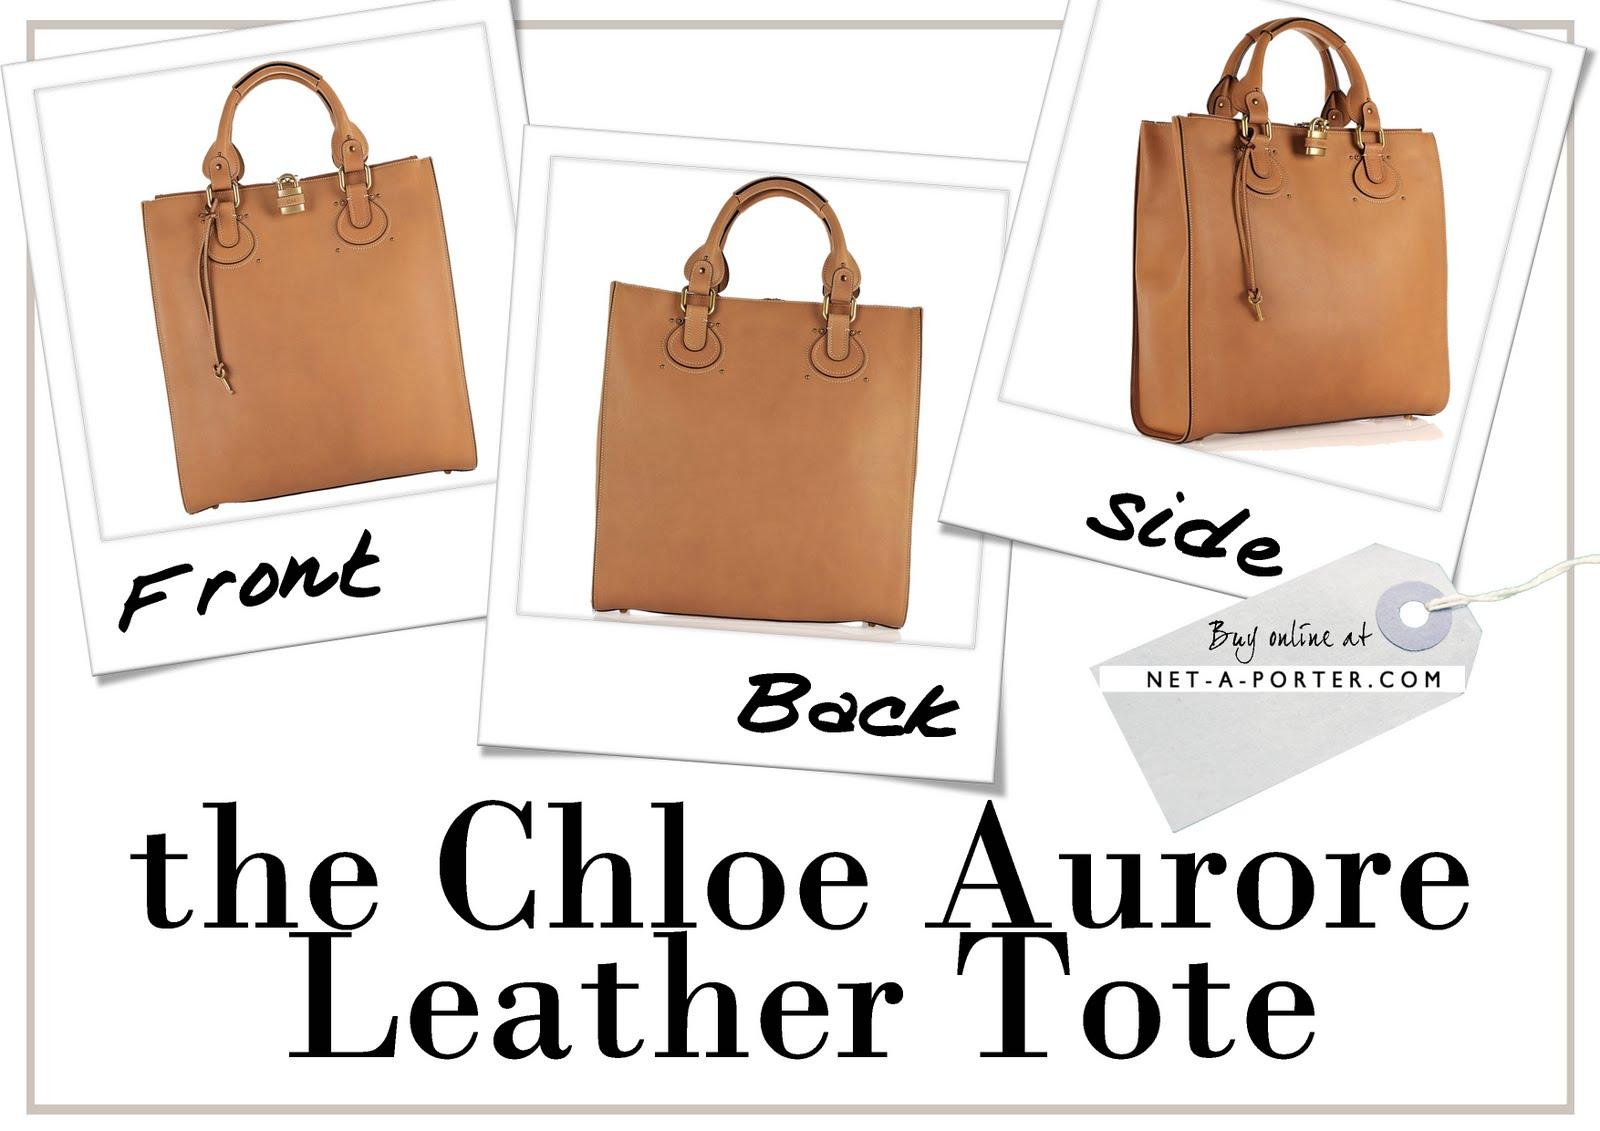 My Latest Handbag Love Affair - The Chloe Aurore Leather Tote ...